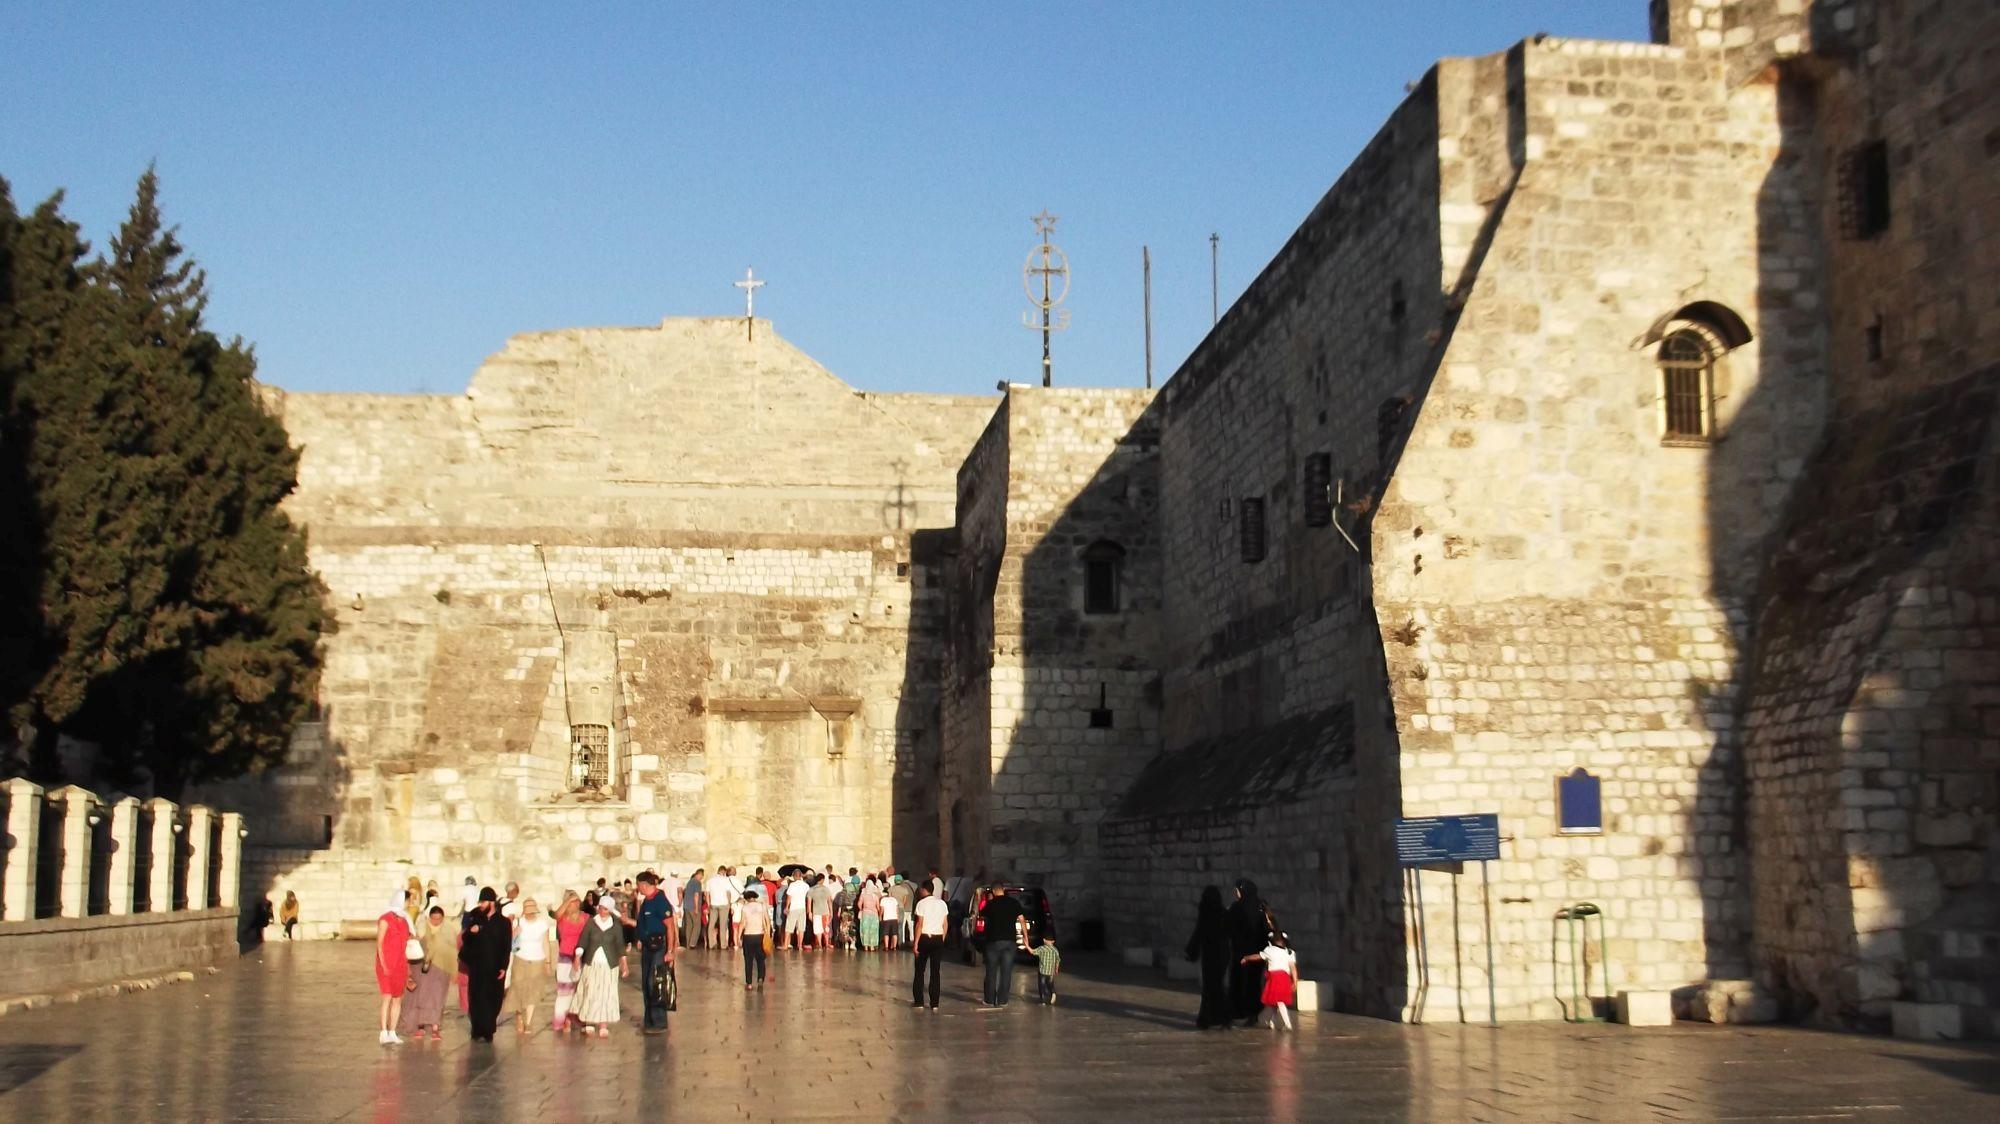 Izrael - Betlejem - zdjęcia, atrakcje